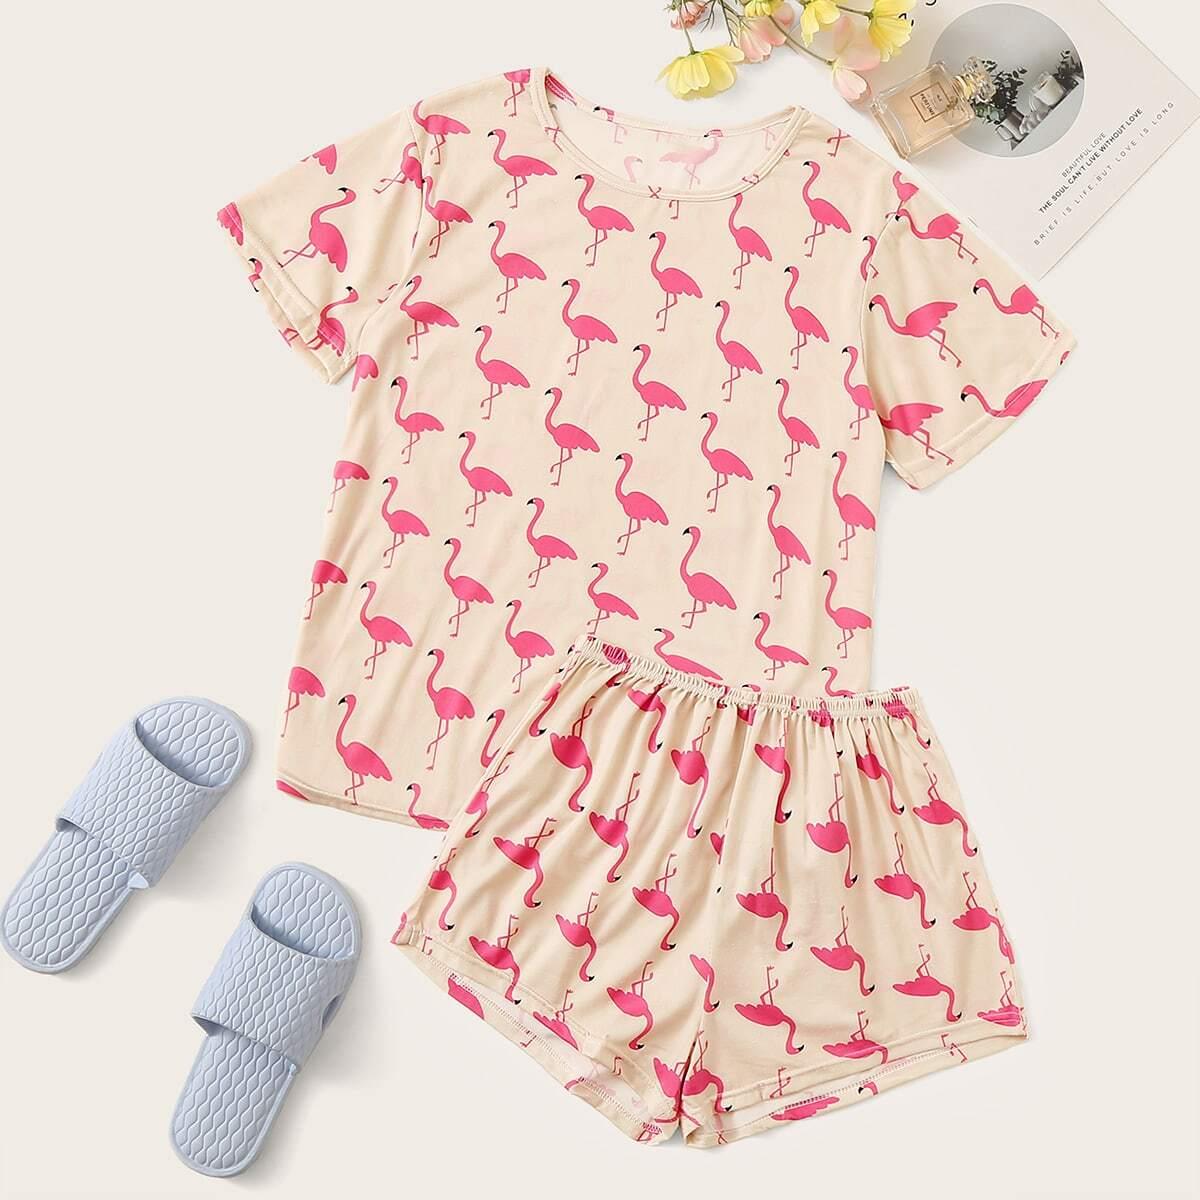 Пижама с принтом фламинго